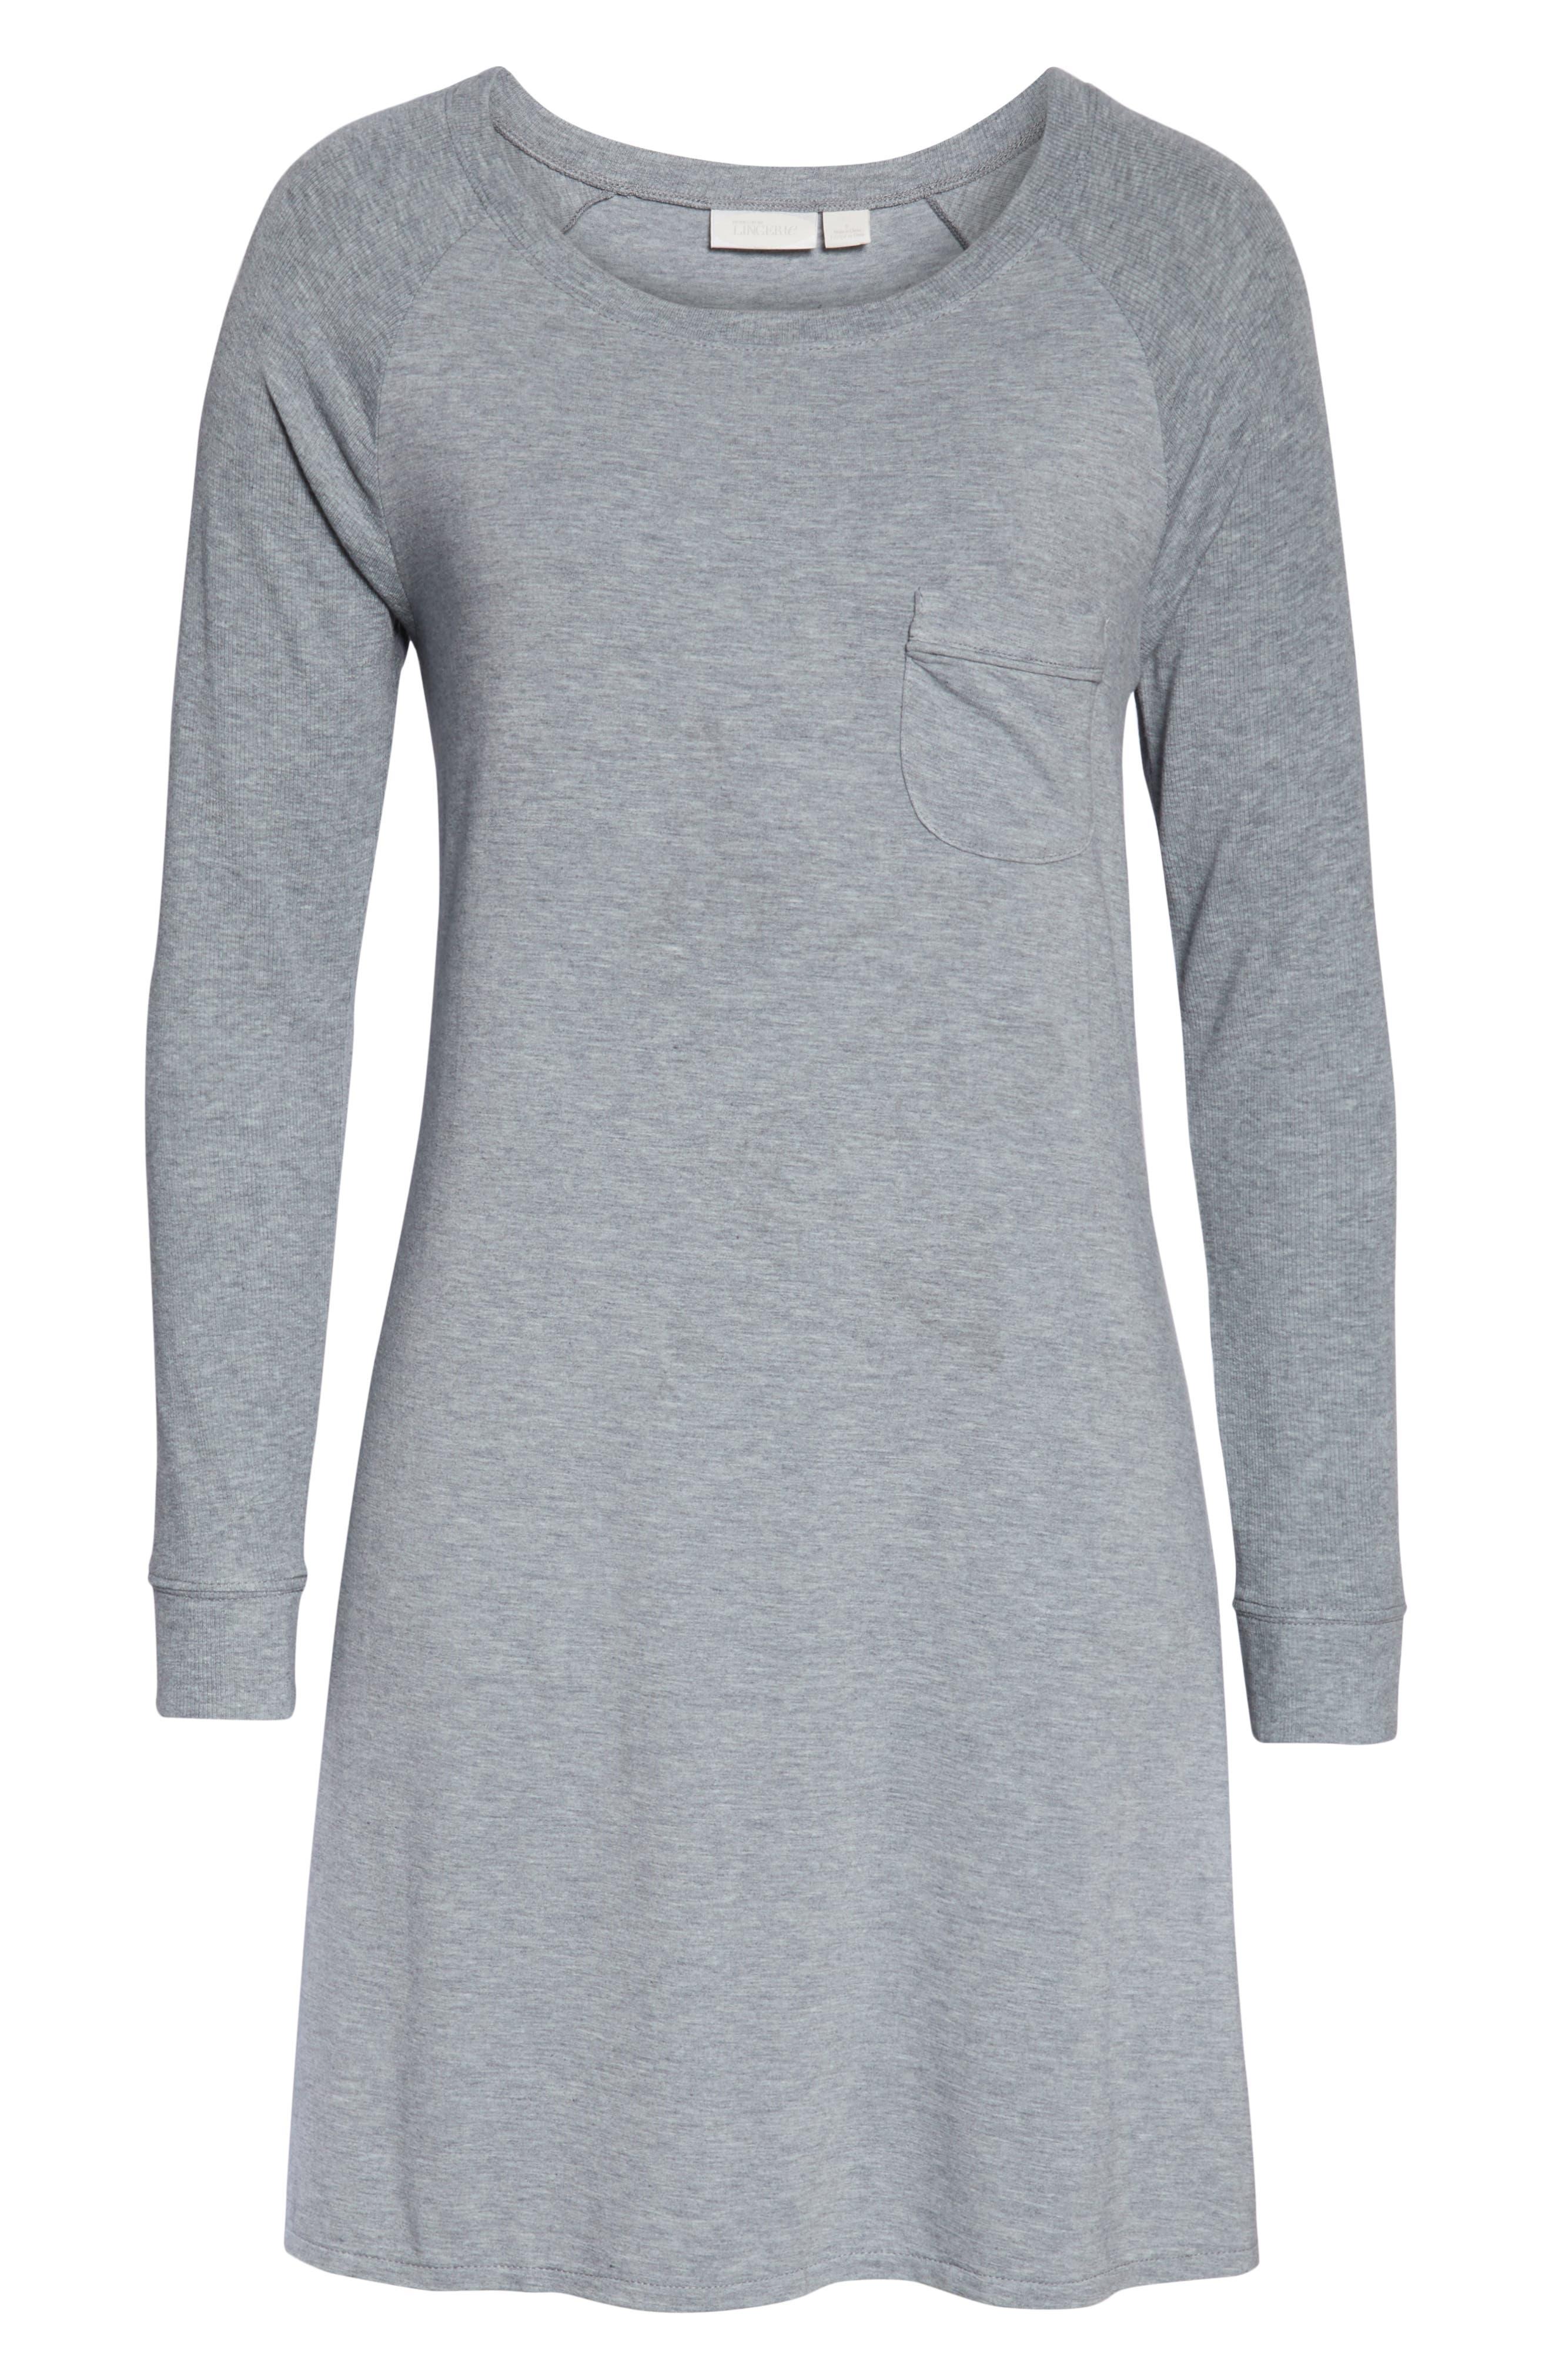 NORDSTROM LINGERIE, Breathe Sleep Shirt, Alternate thumbnail 6, color, GREY STEEL HEATHER